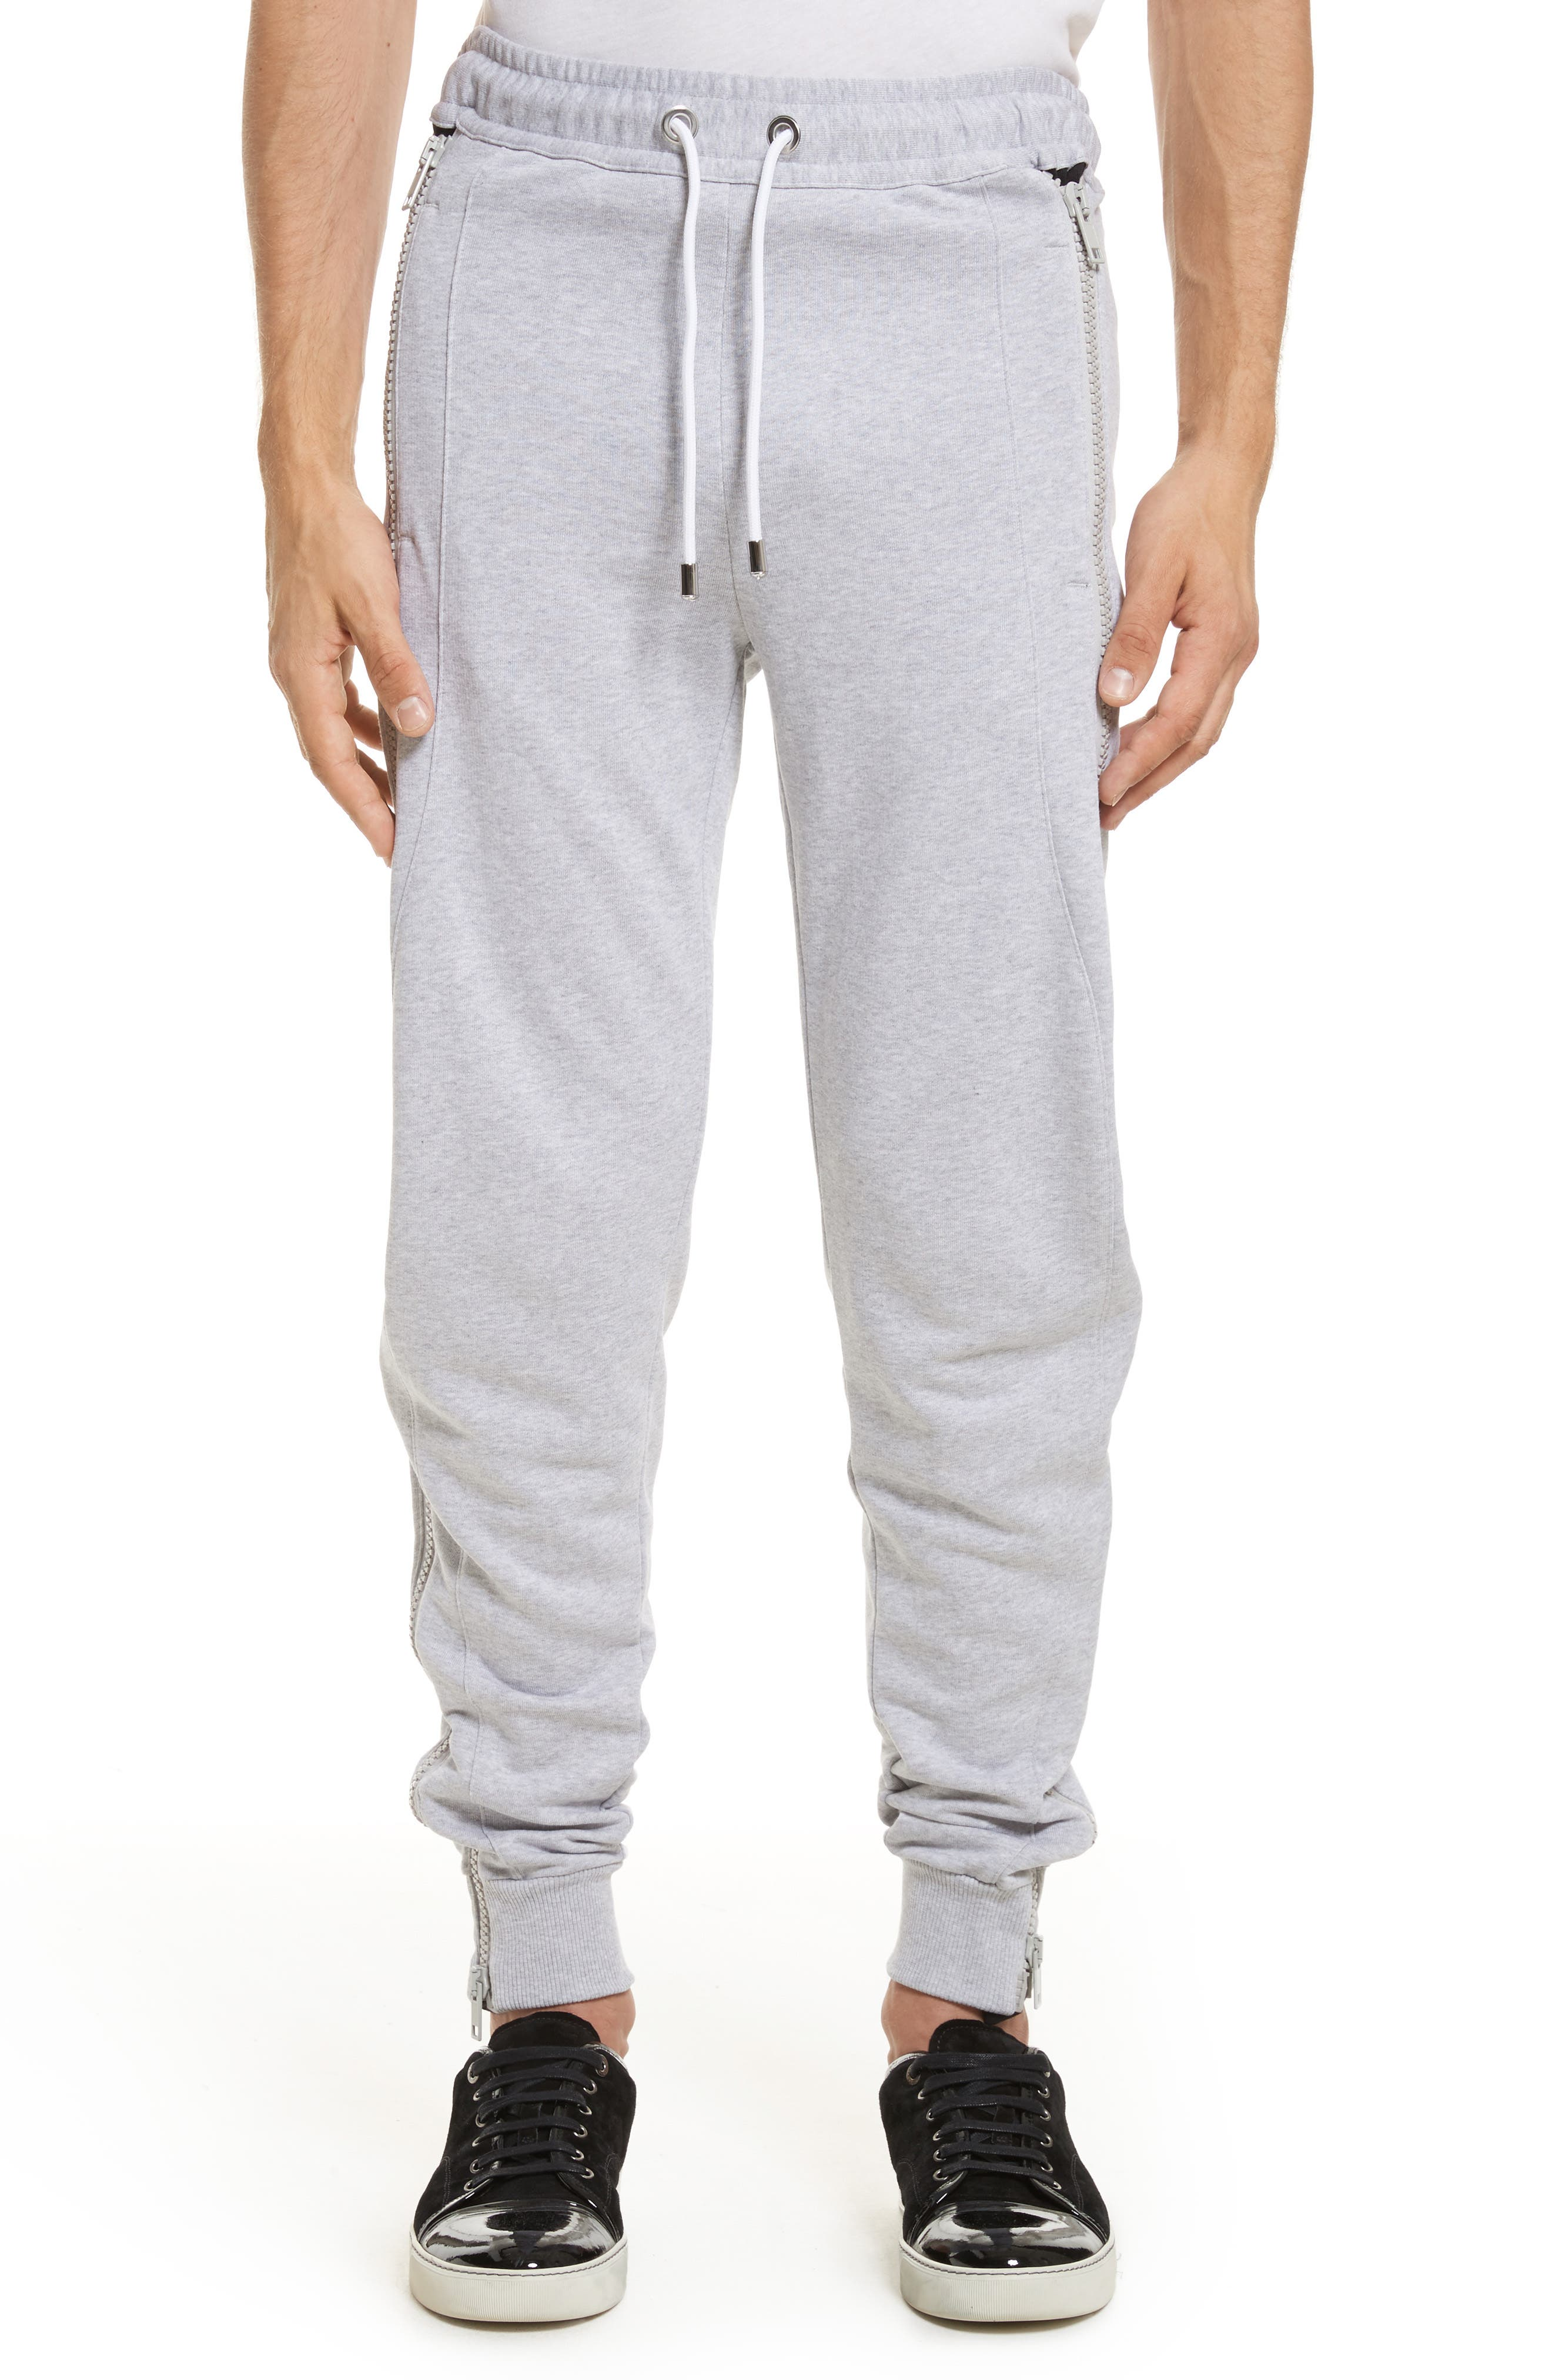 VERSUS by Versace Side Zip Sweatpants